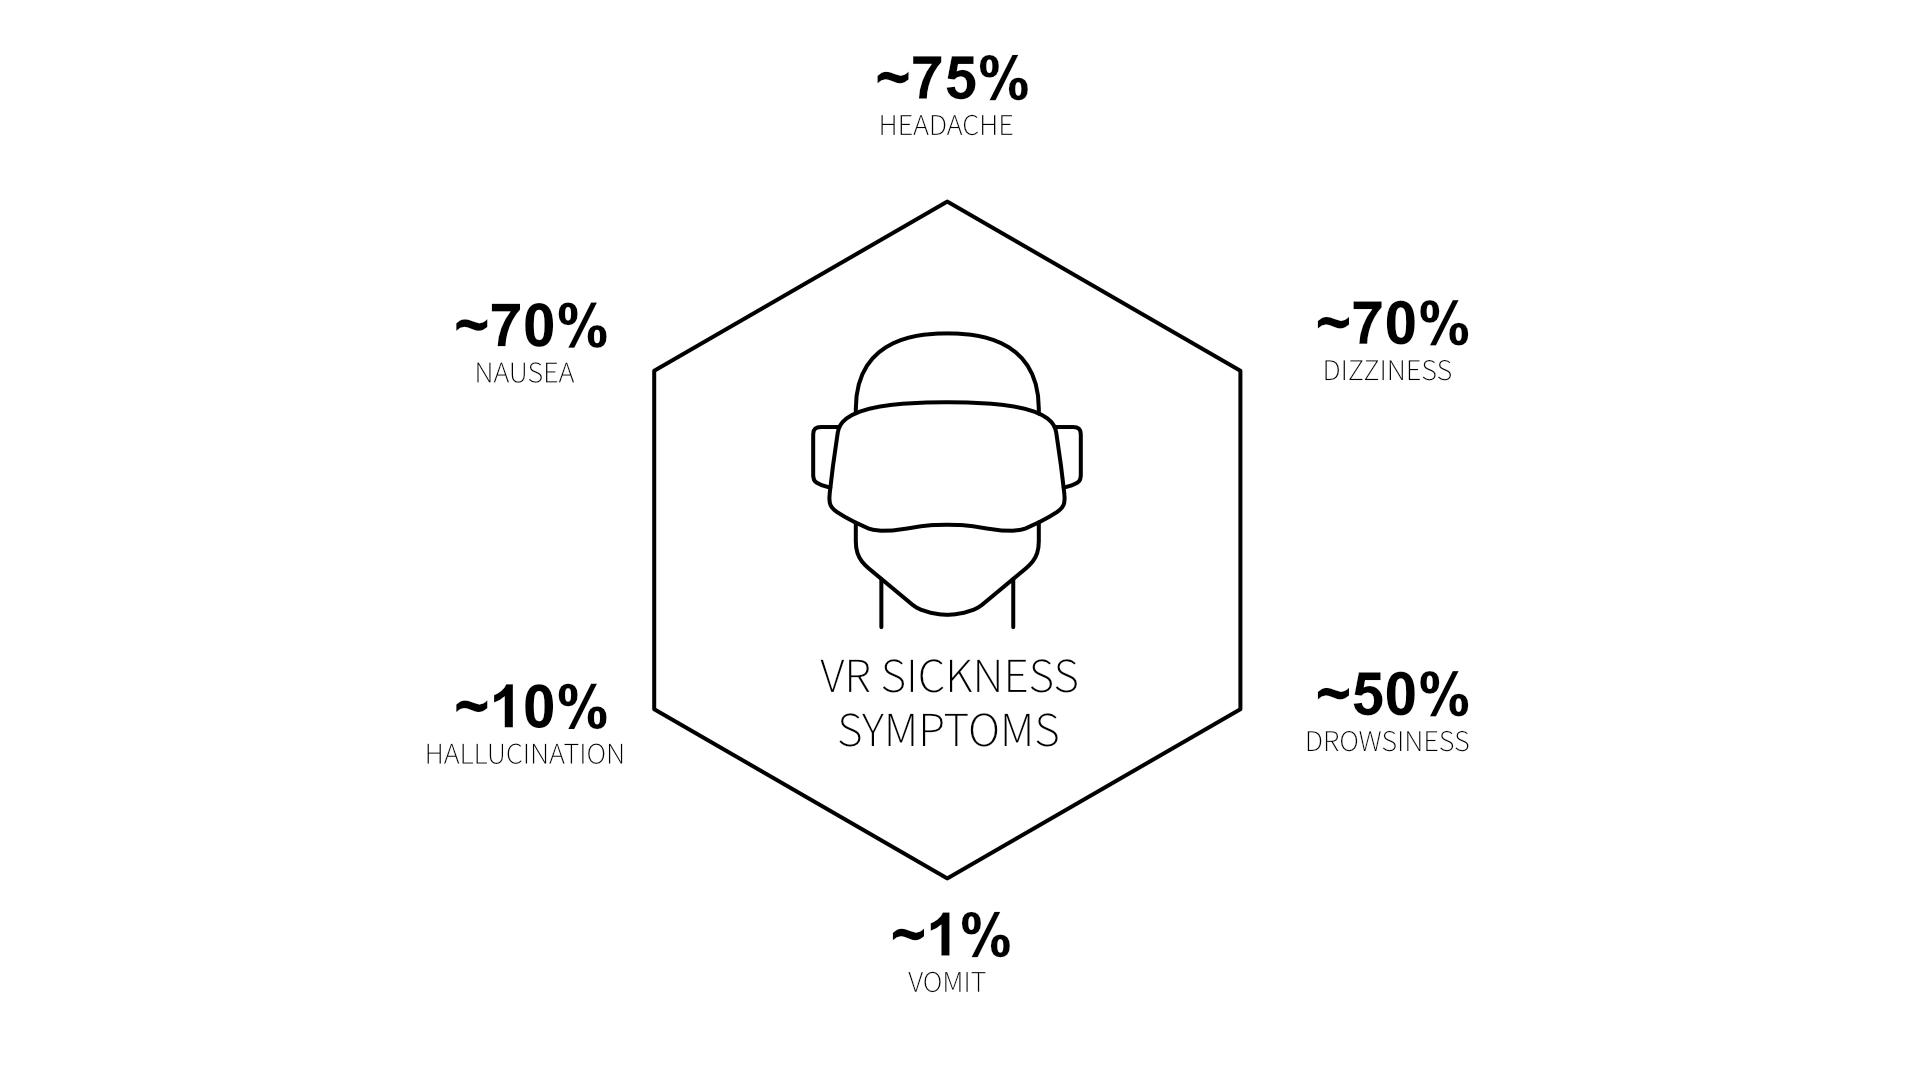 VR Sickness